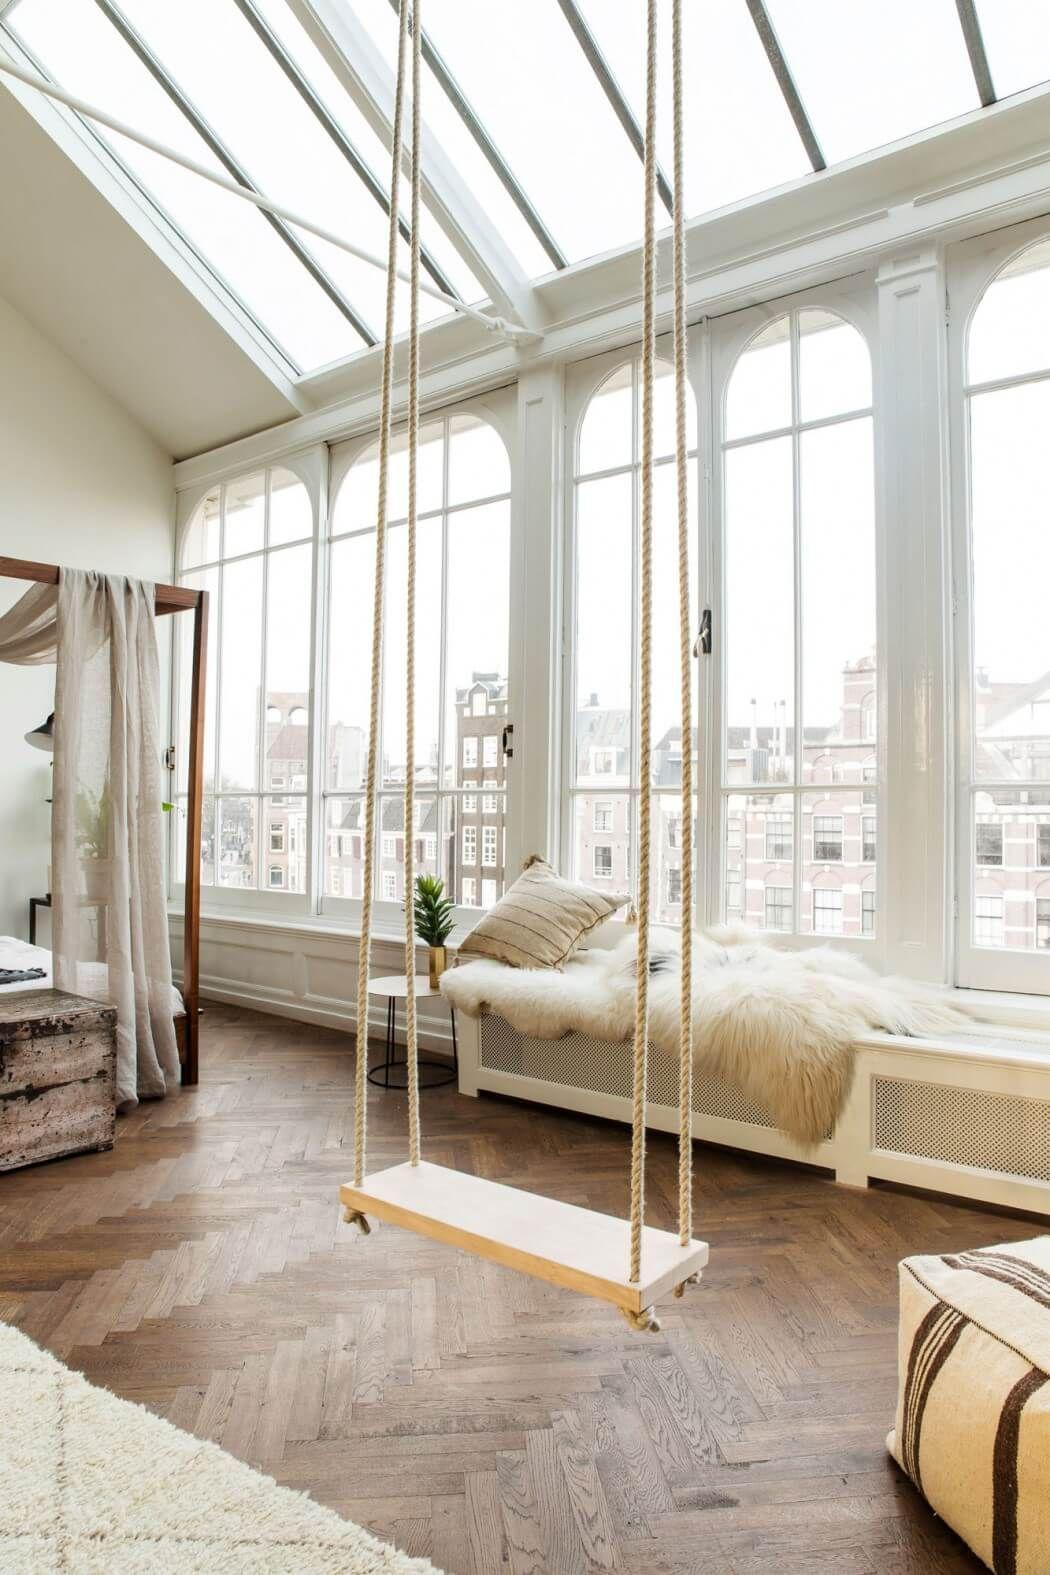 Loft bedroom style  Enter the Loft  Lofts Interiors and House